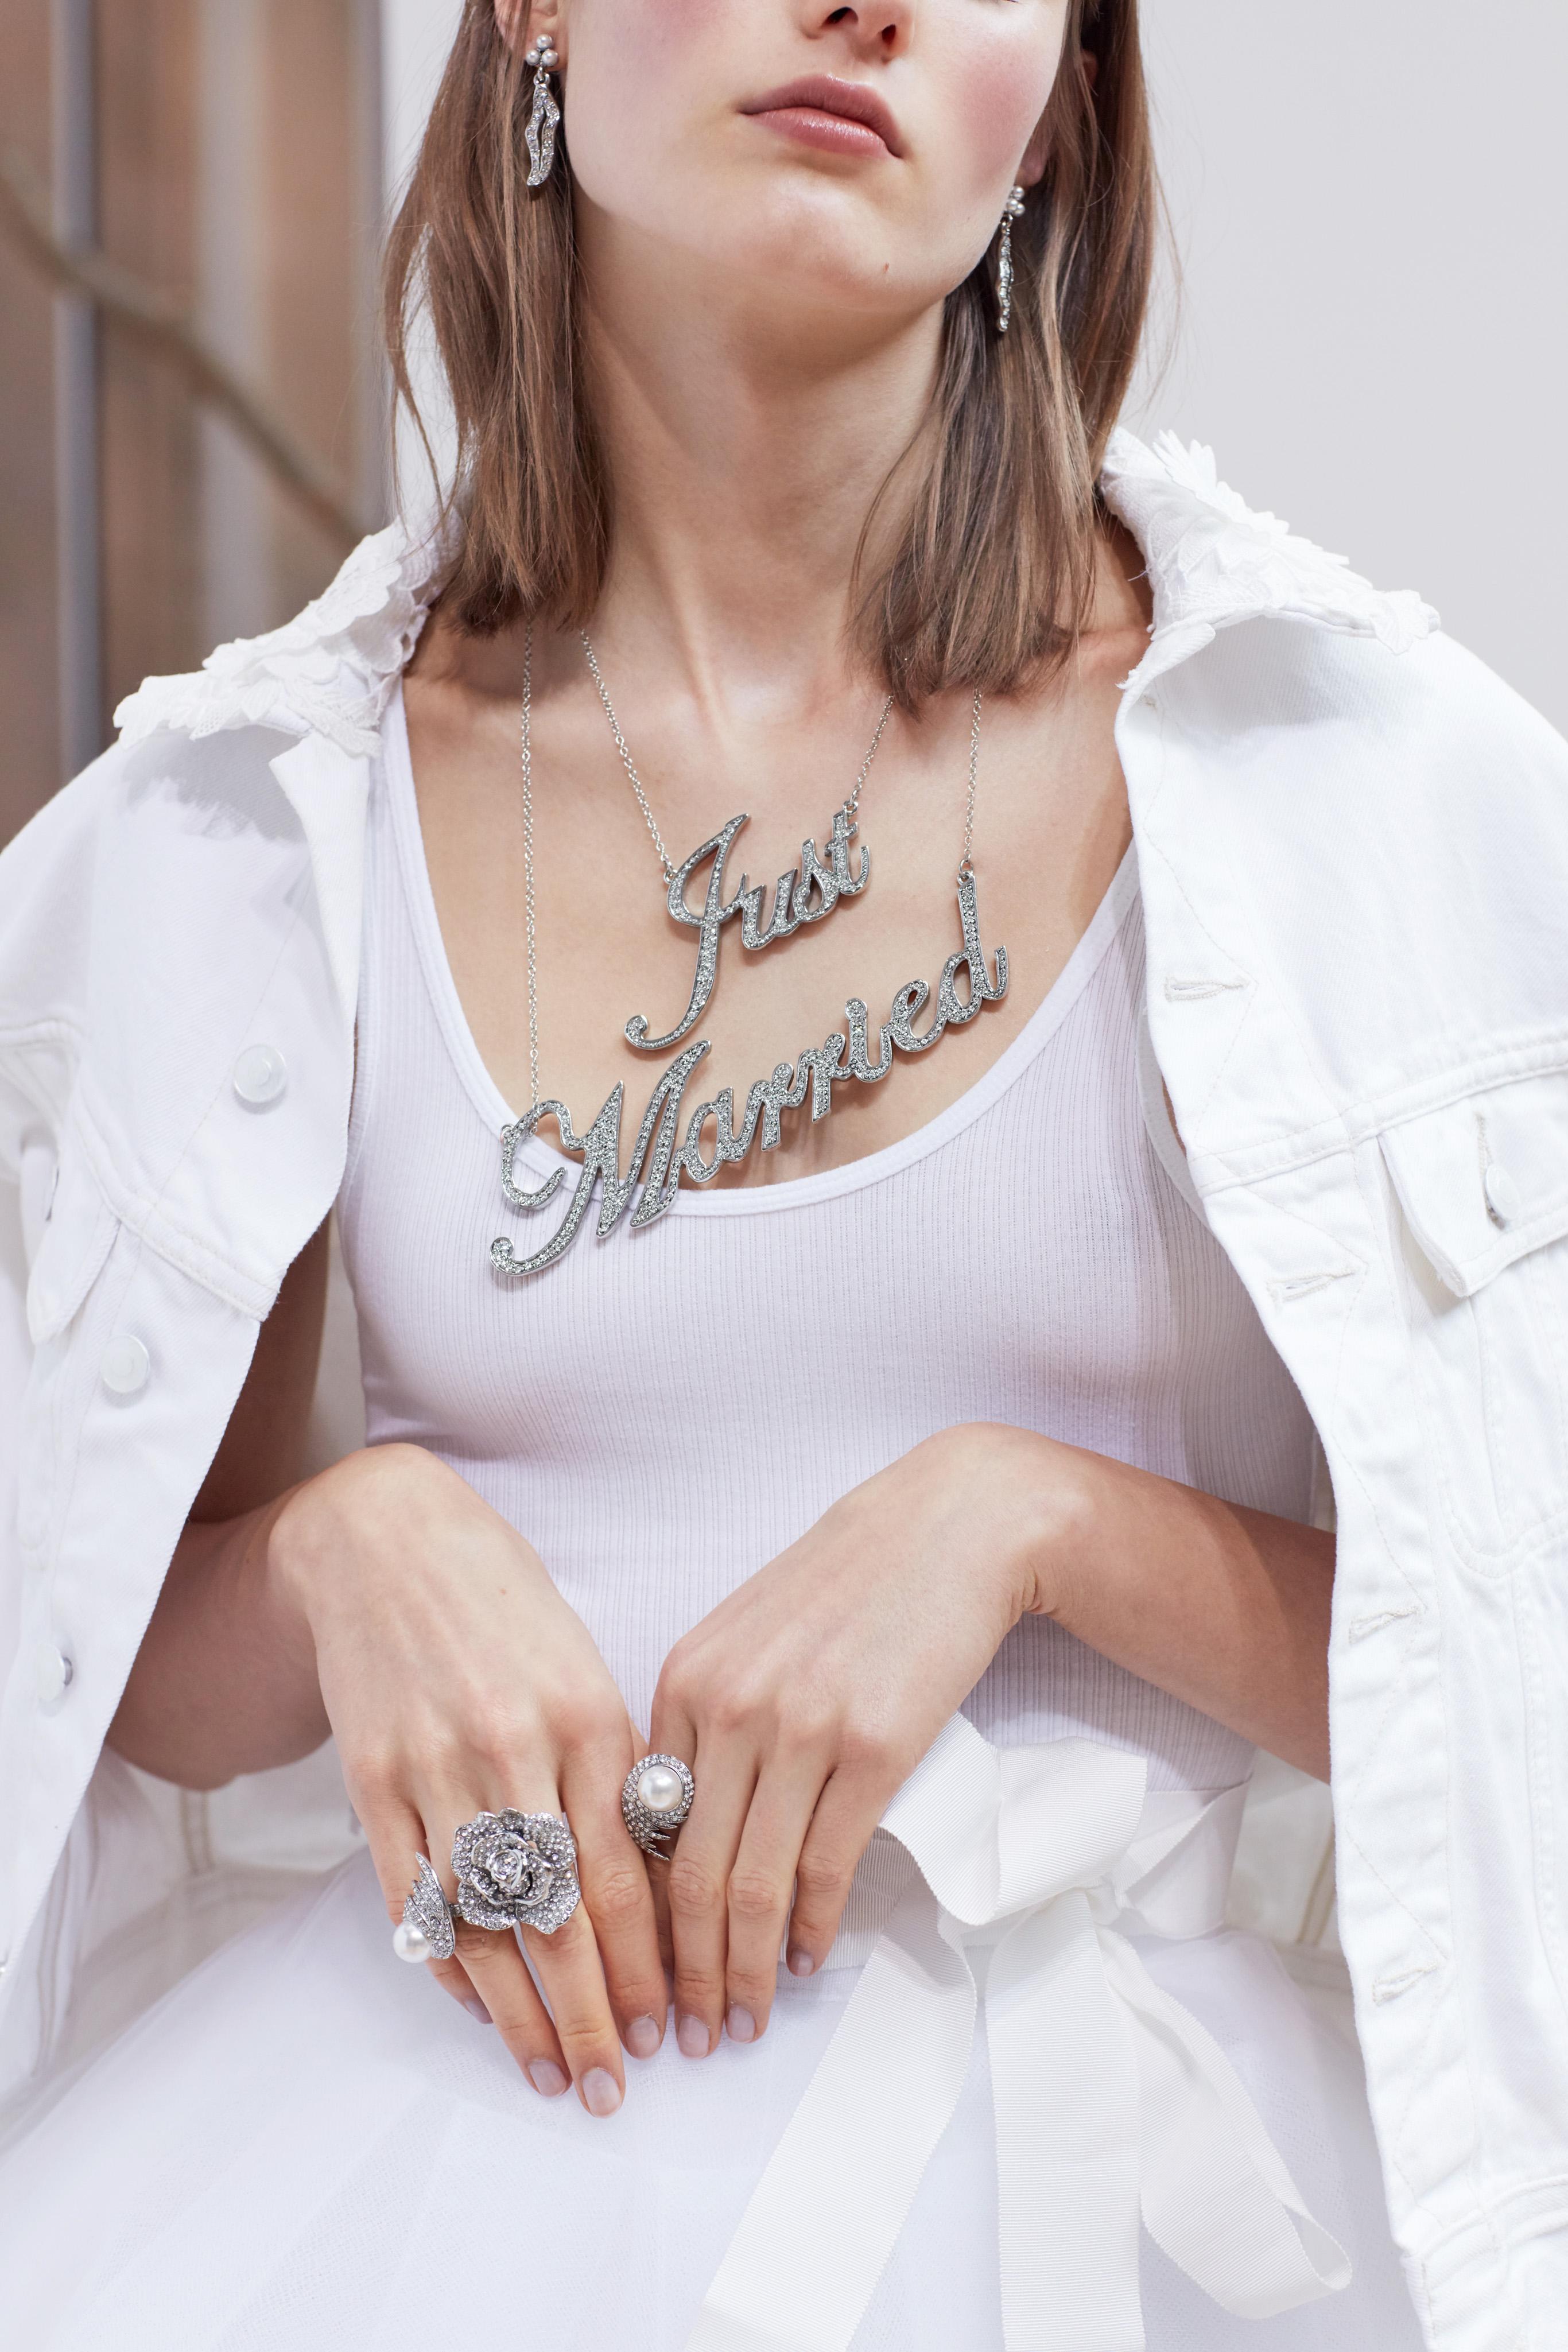 tank with jacket Oscar de la Renta Spring 2018 Wedding Dress Collection